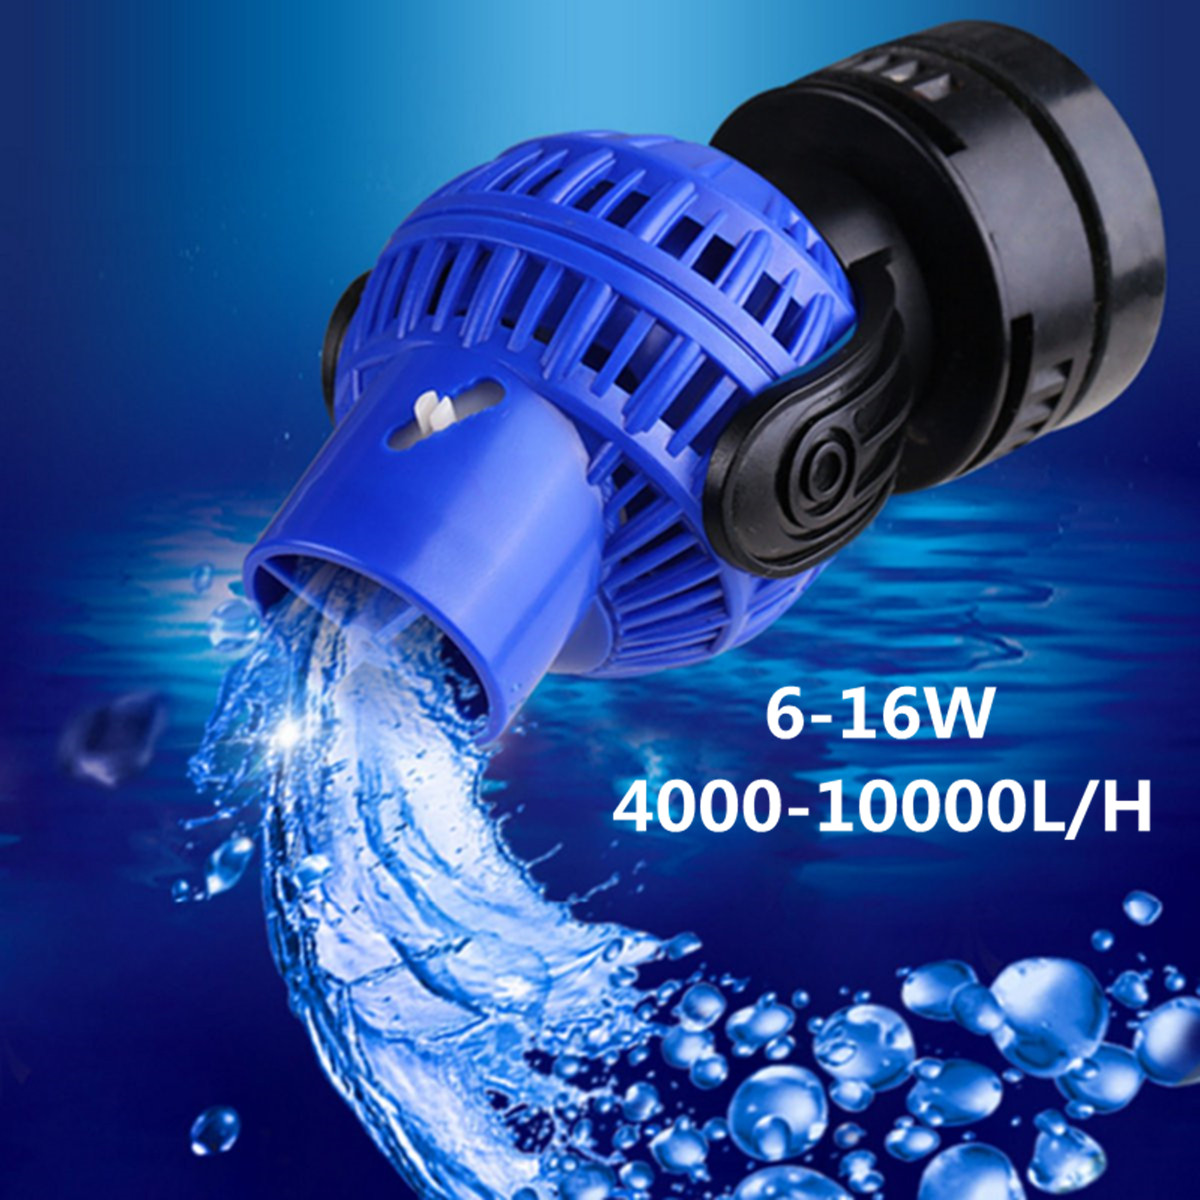 Aquarium Fish Tank 360 Water Wave Maker Pump Powerhead Magnet Base 4000-15000L/H Wave Maker For Aquarium Fish Tank Aquarium Pump